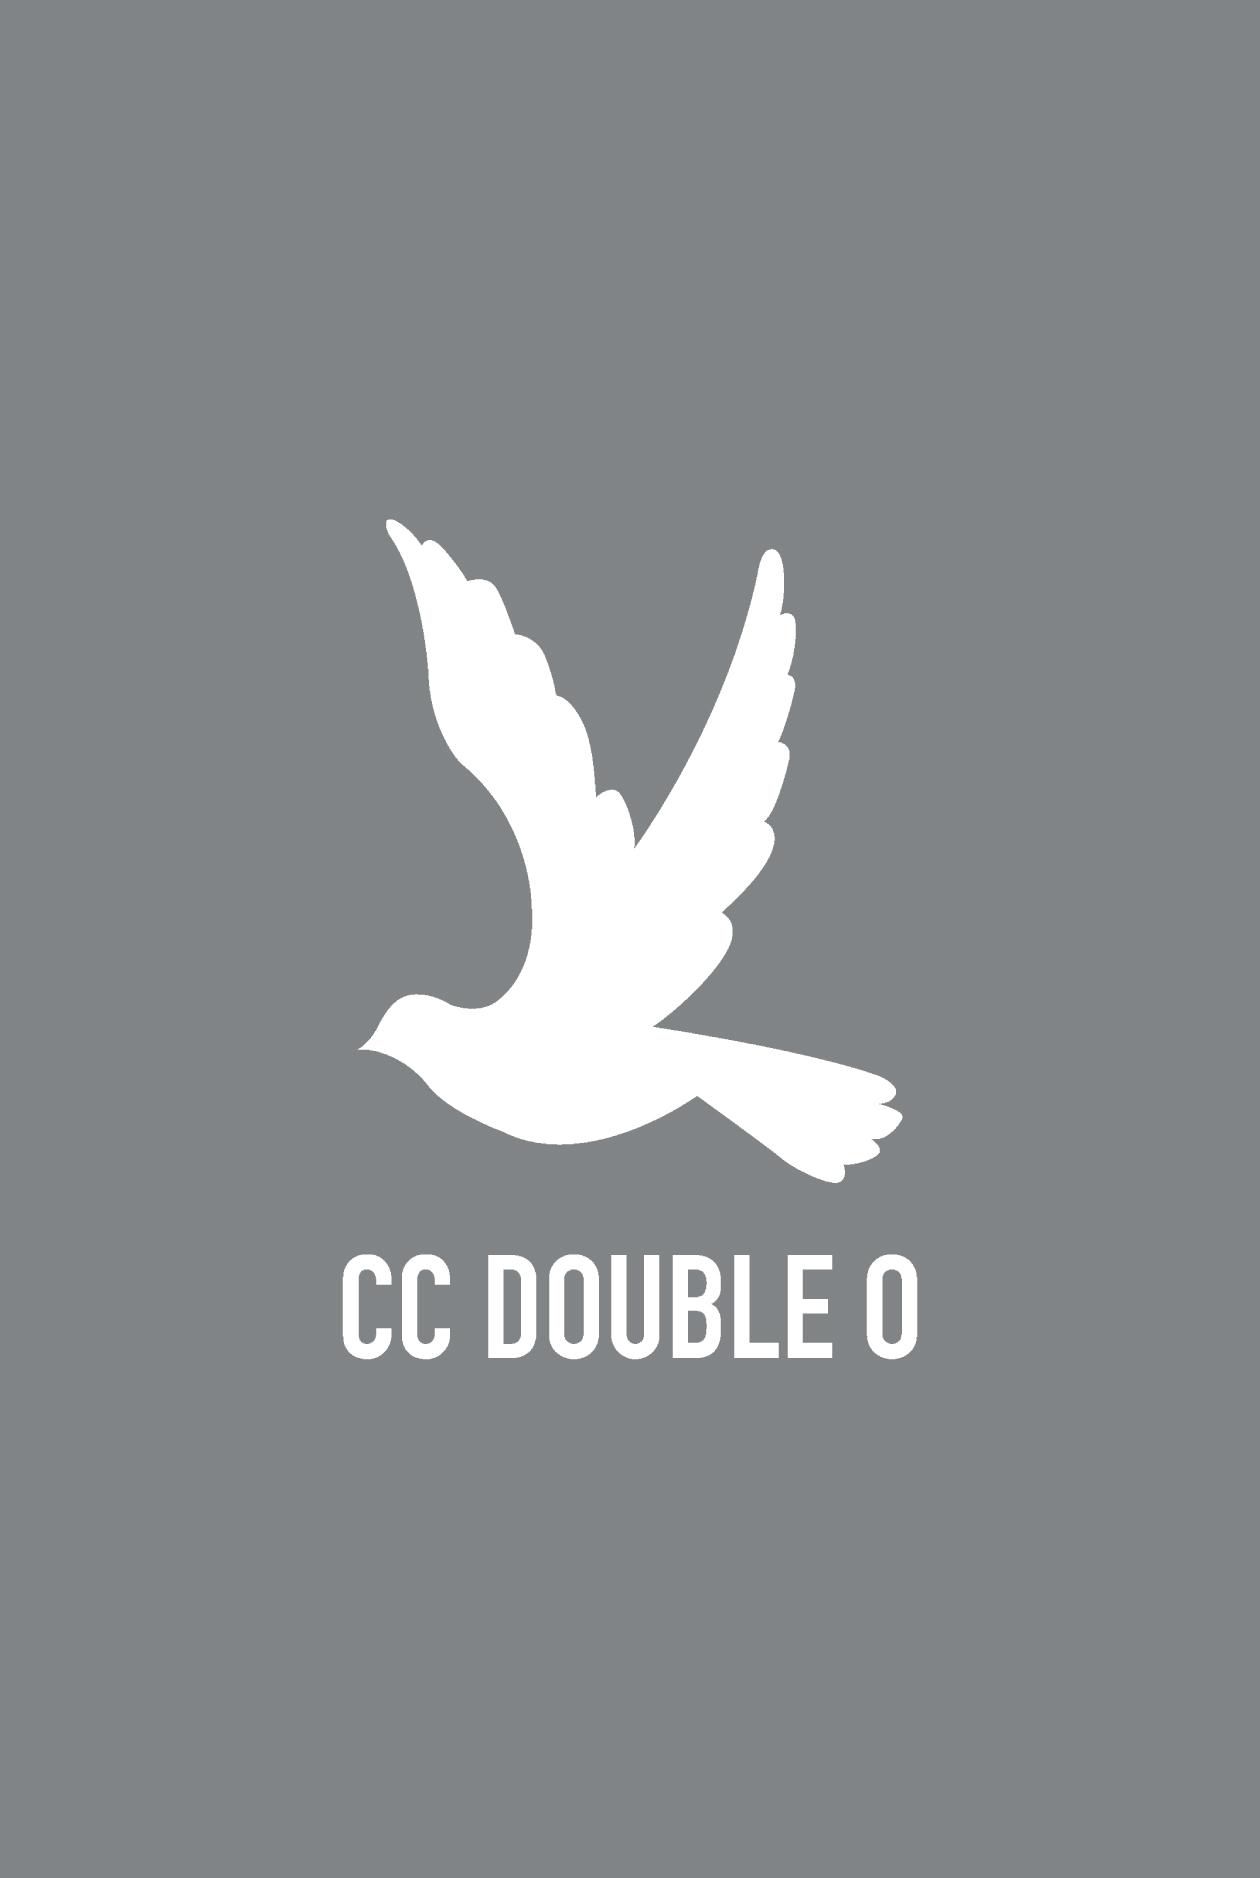 eed350f24b1 Bird Logo Cap with CC DOUBLE O Logo Detail - HATS - MEN ...